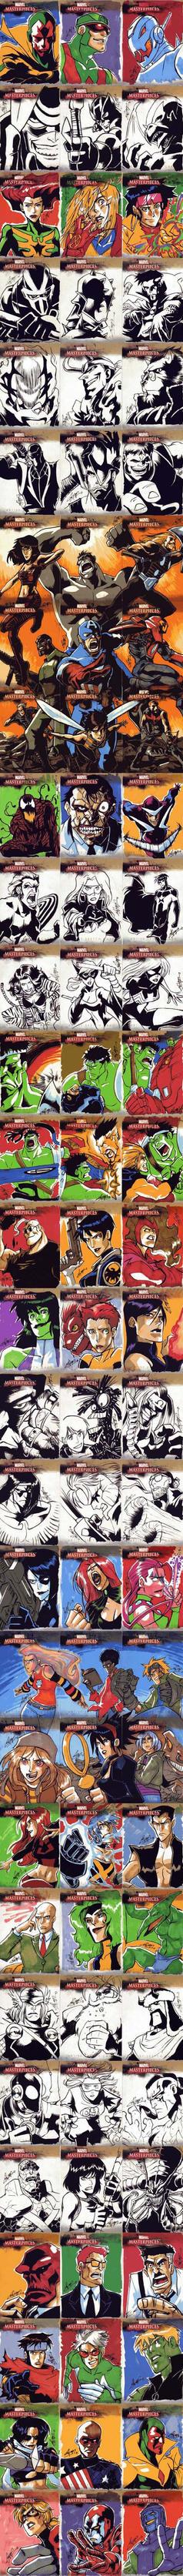 Marvel Sketchcards - 2 of 4 by eisu